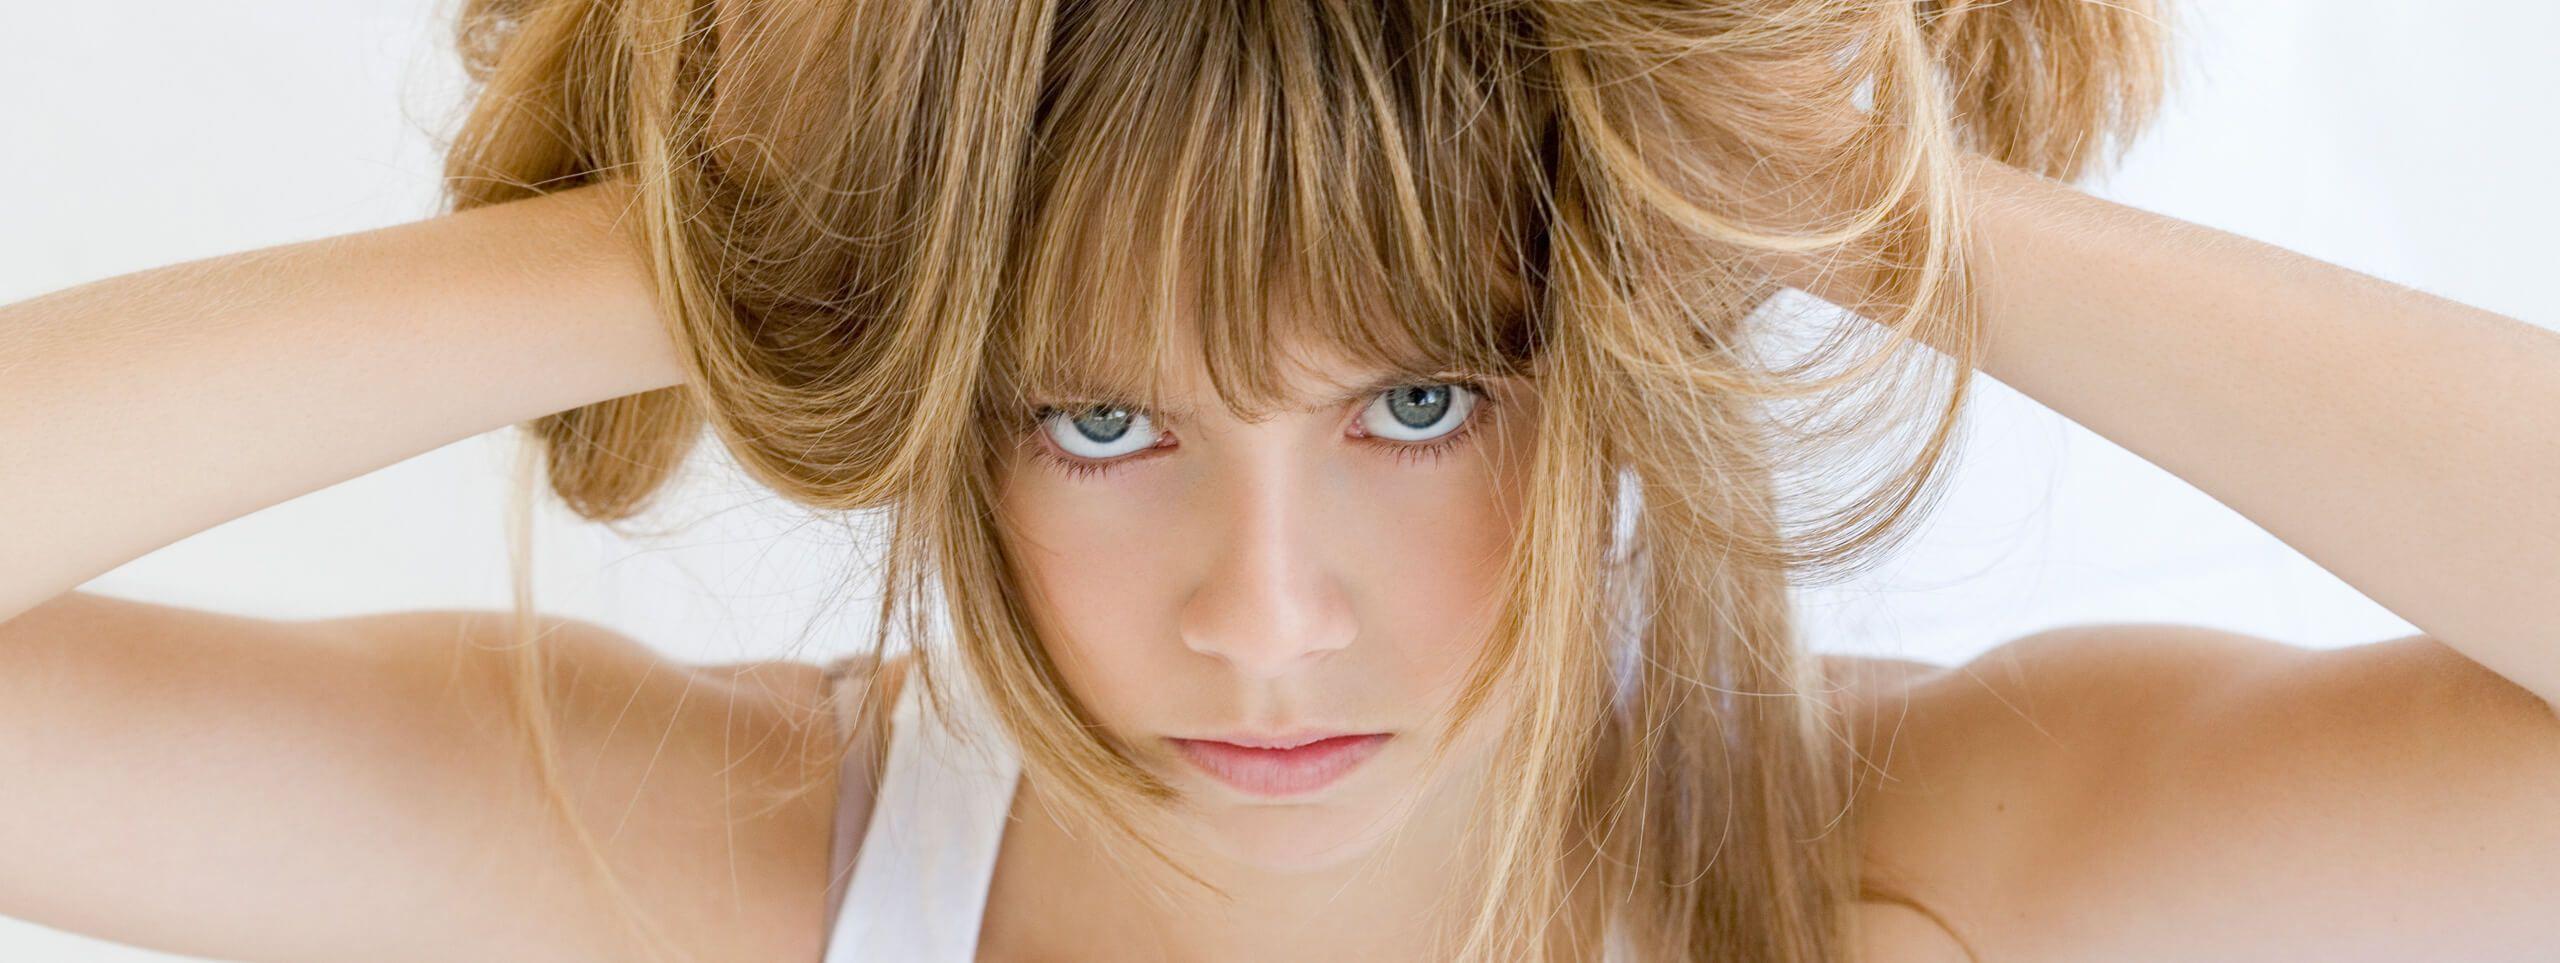 Woman with sensitive scalp